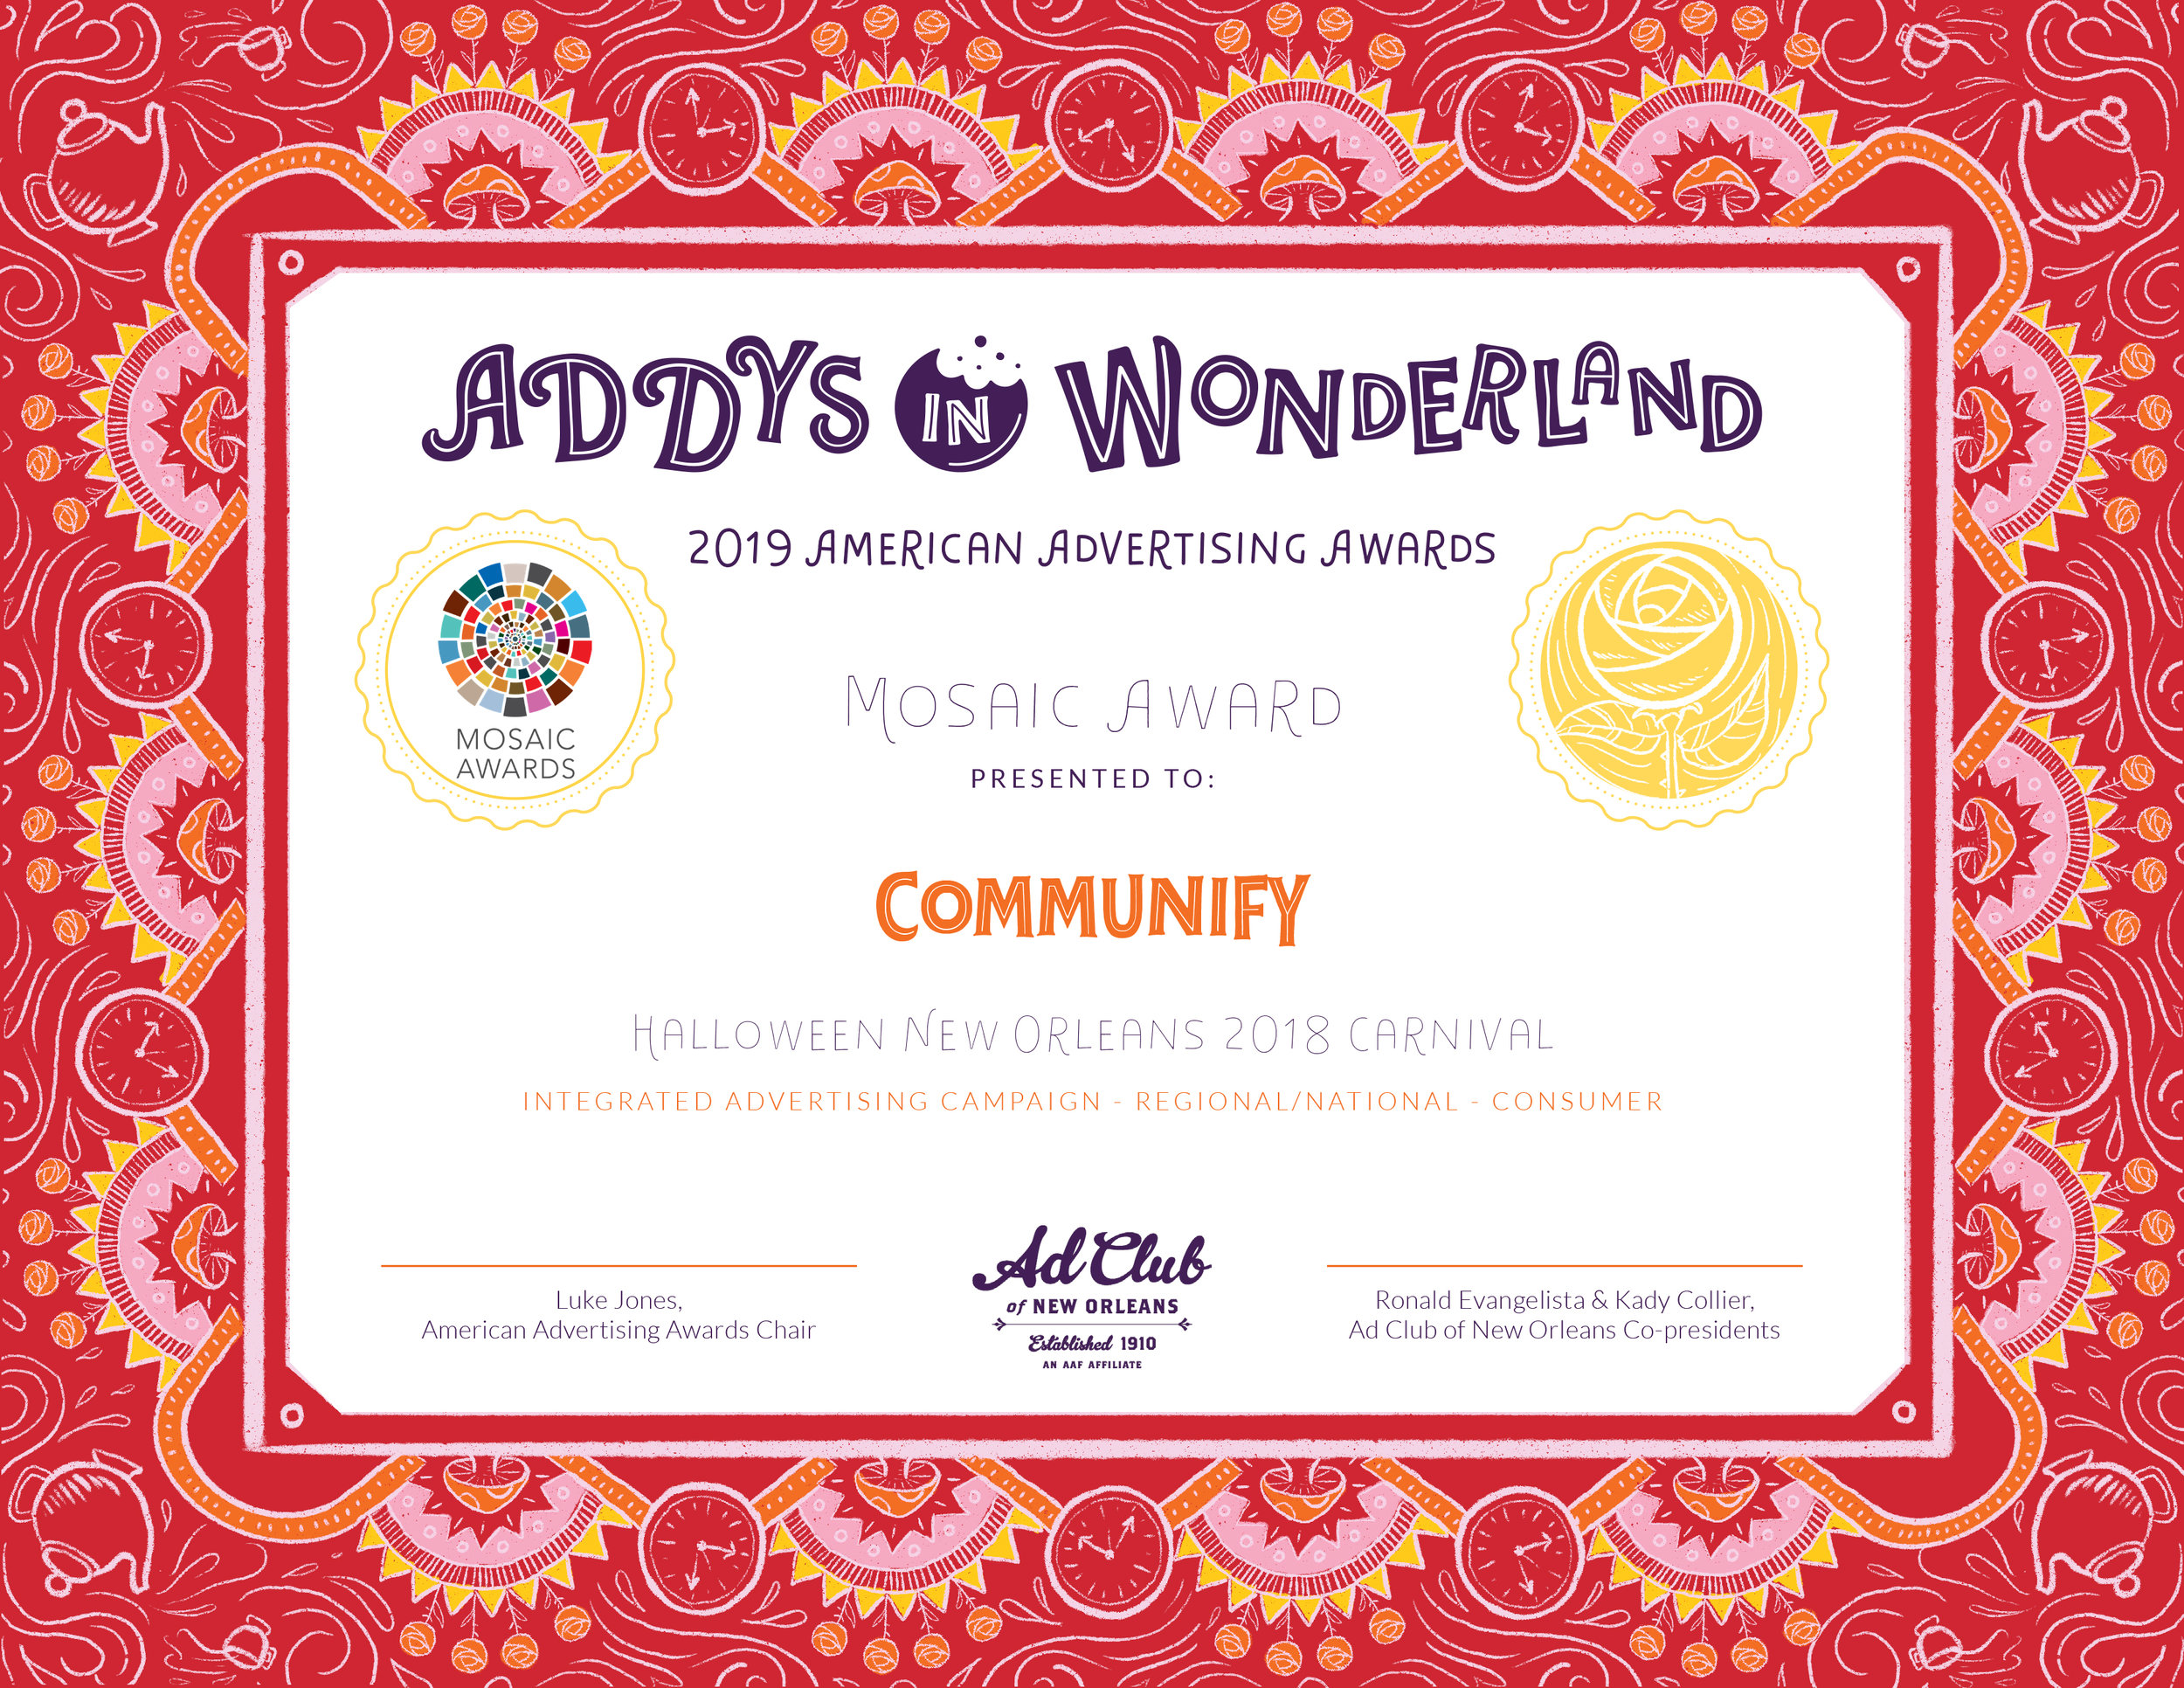 Mosaic Award Certificate